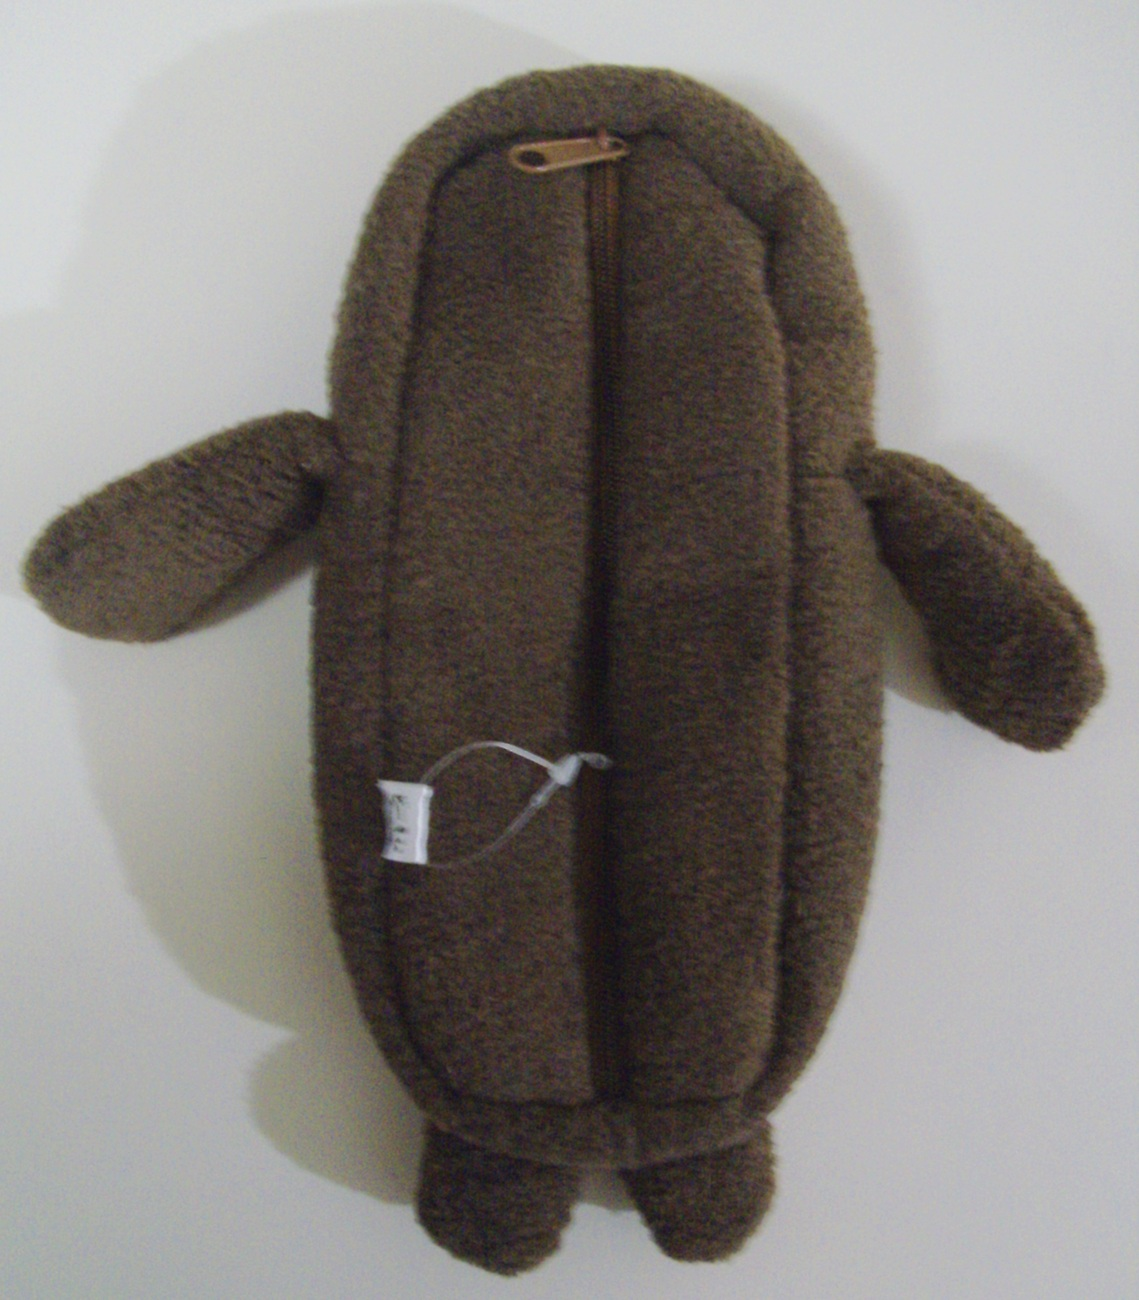 Domo plush coin bag, purse, handbag, cell phone holder case - New w/o tags